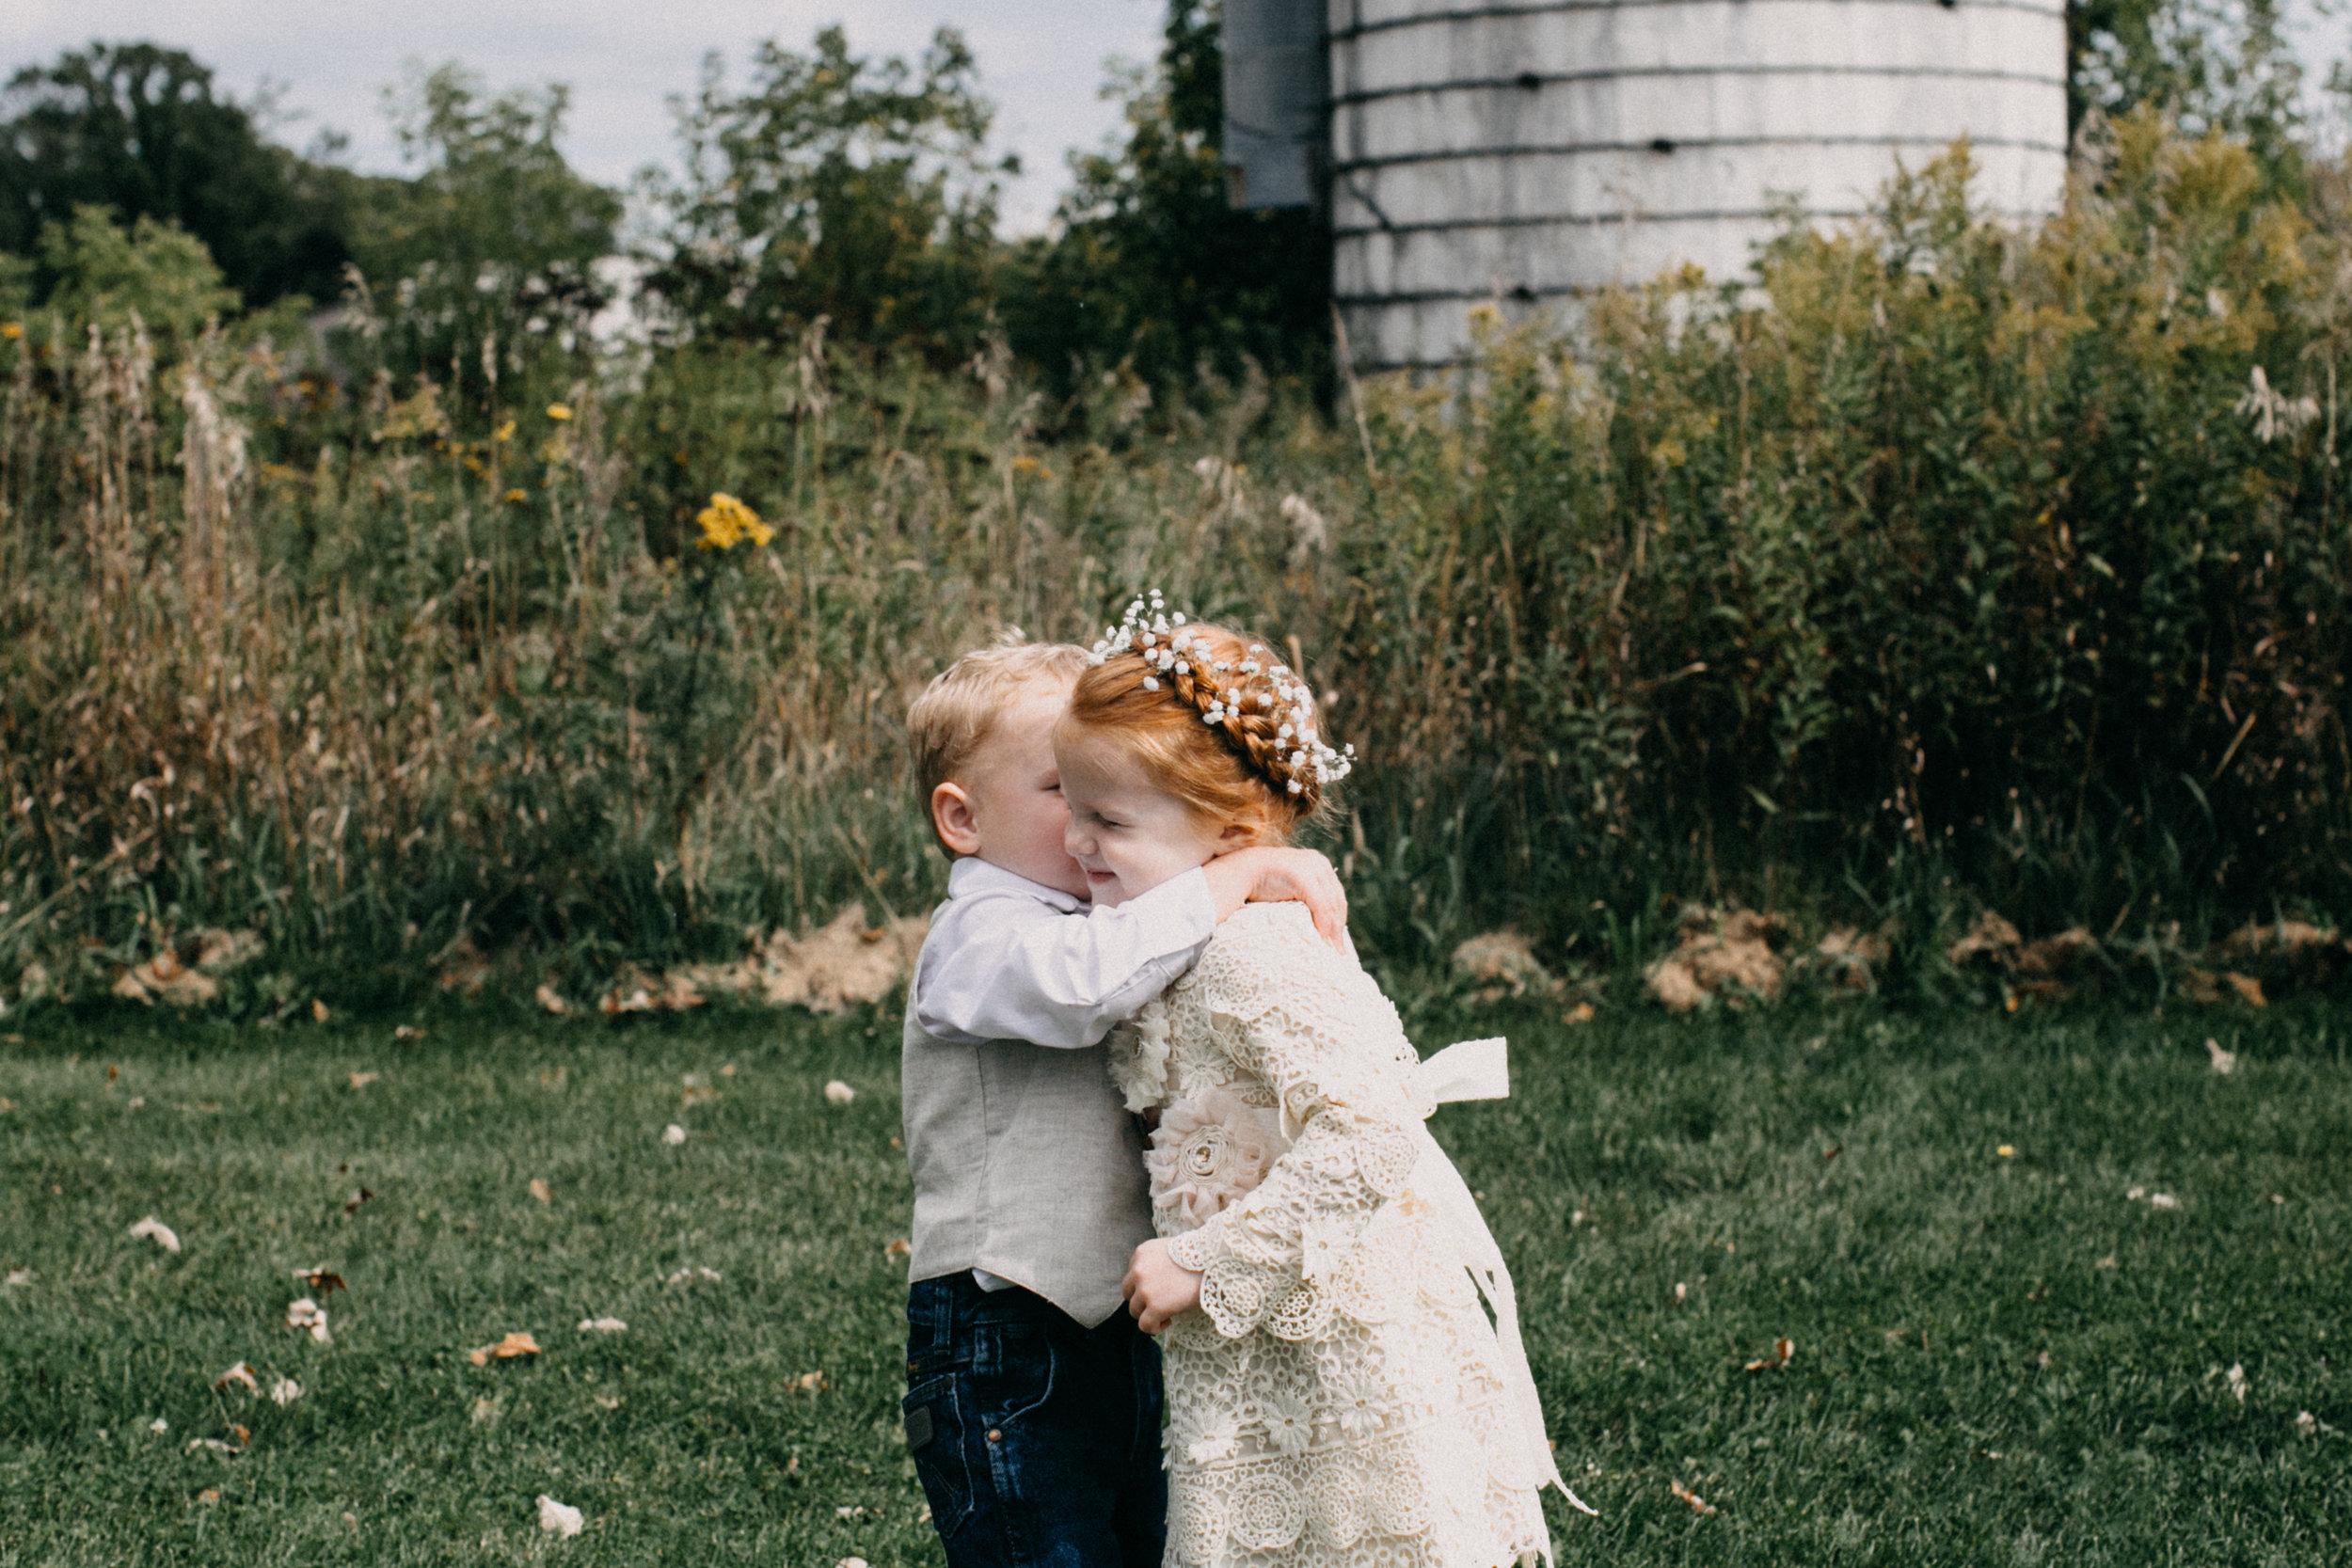 Adorable flower girl and ring bearer at barn wedding in Brainerd MN